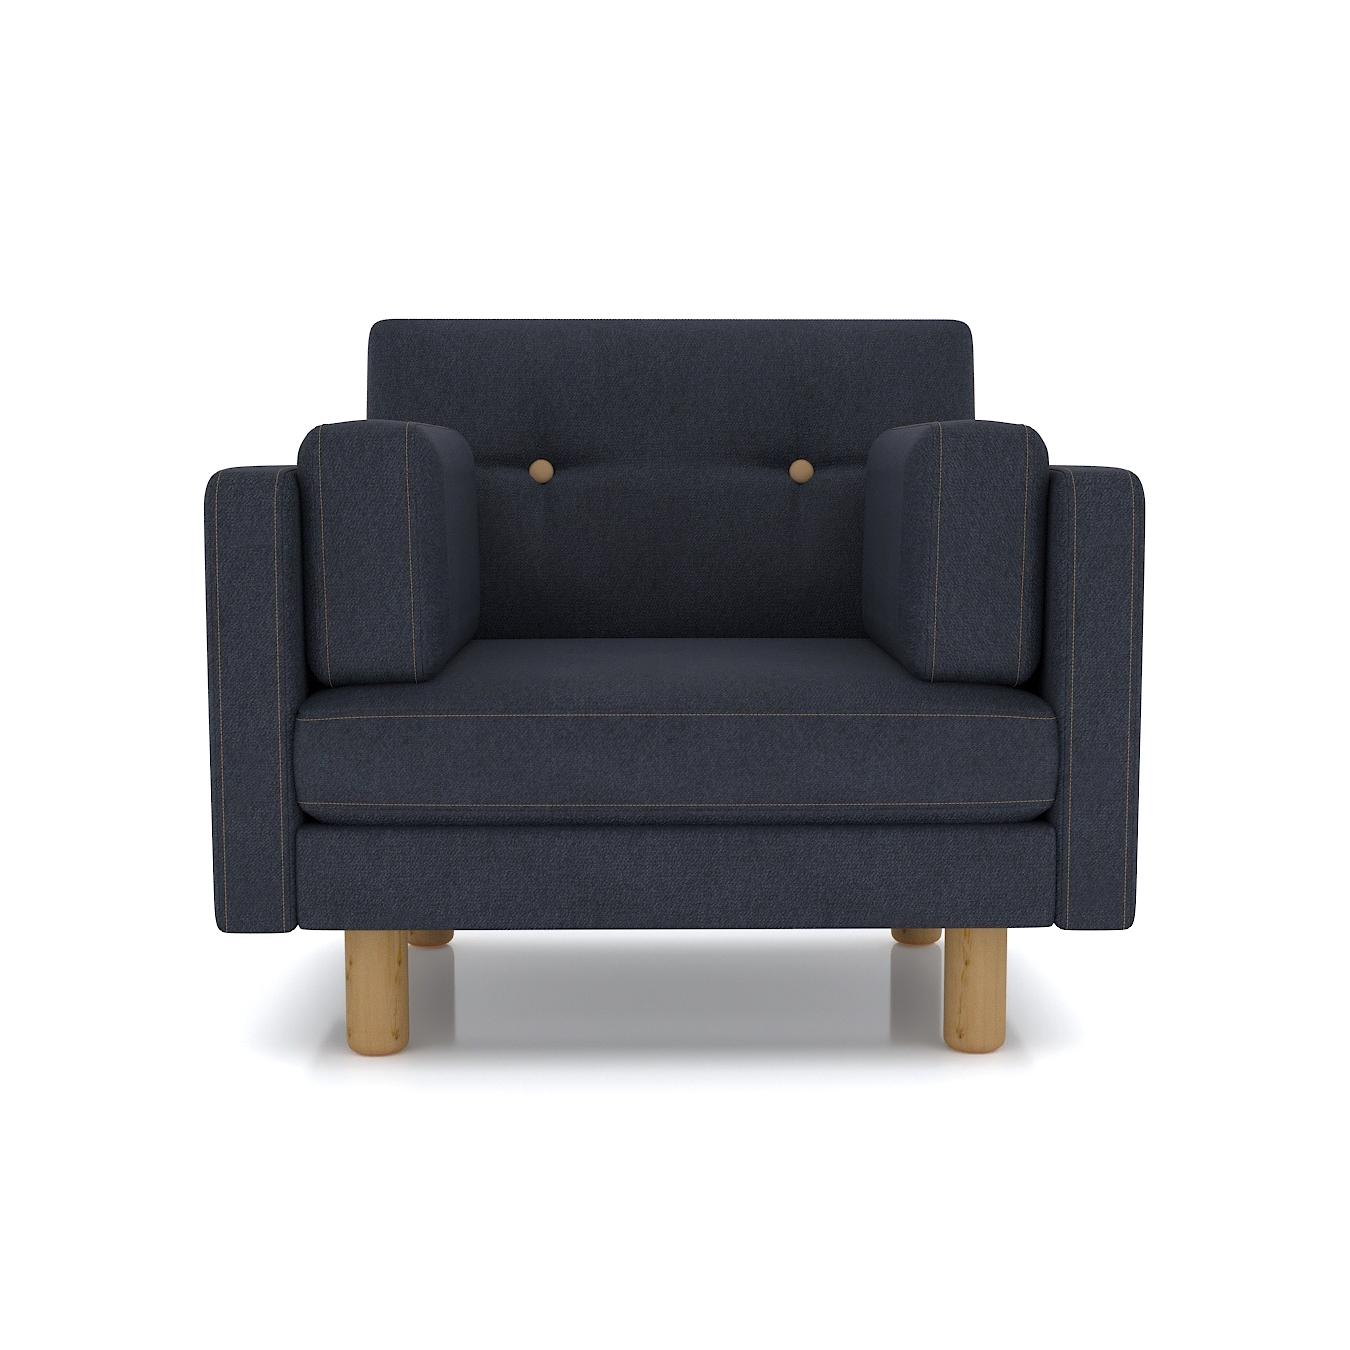 Кресло AS Изабелла м 90x80x83 антрацитовый диваны